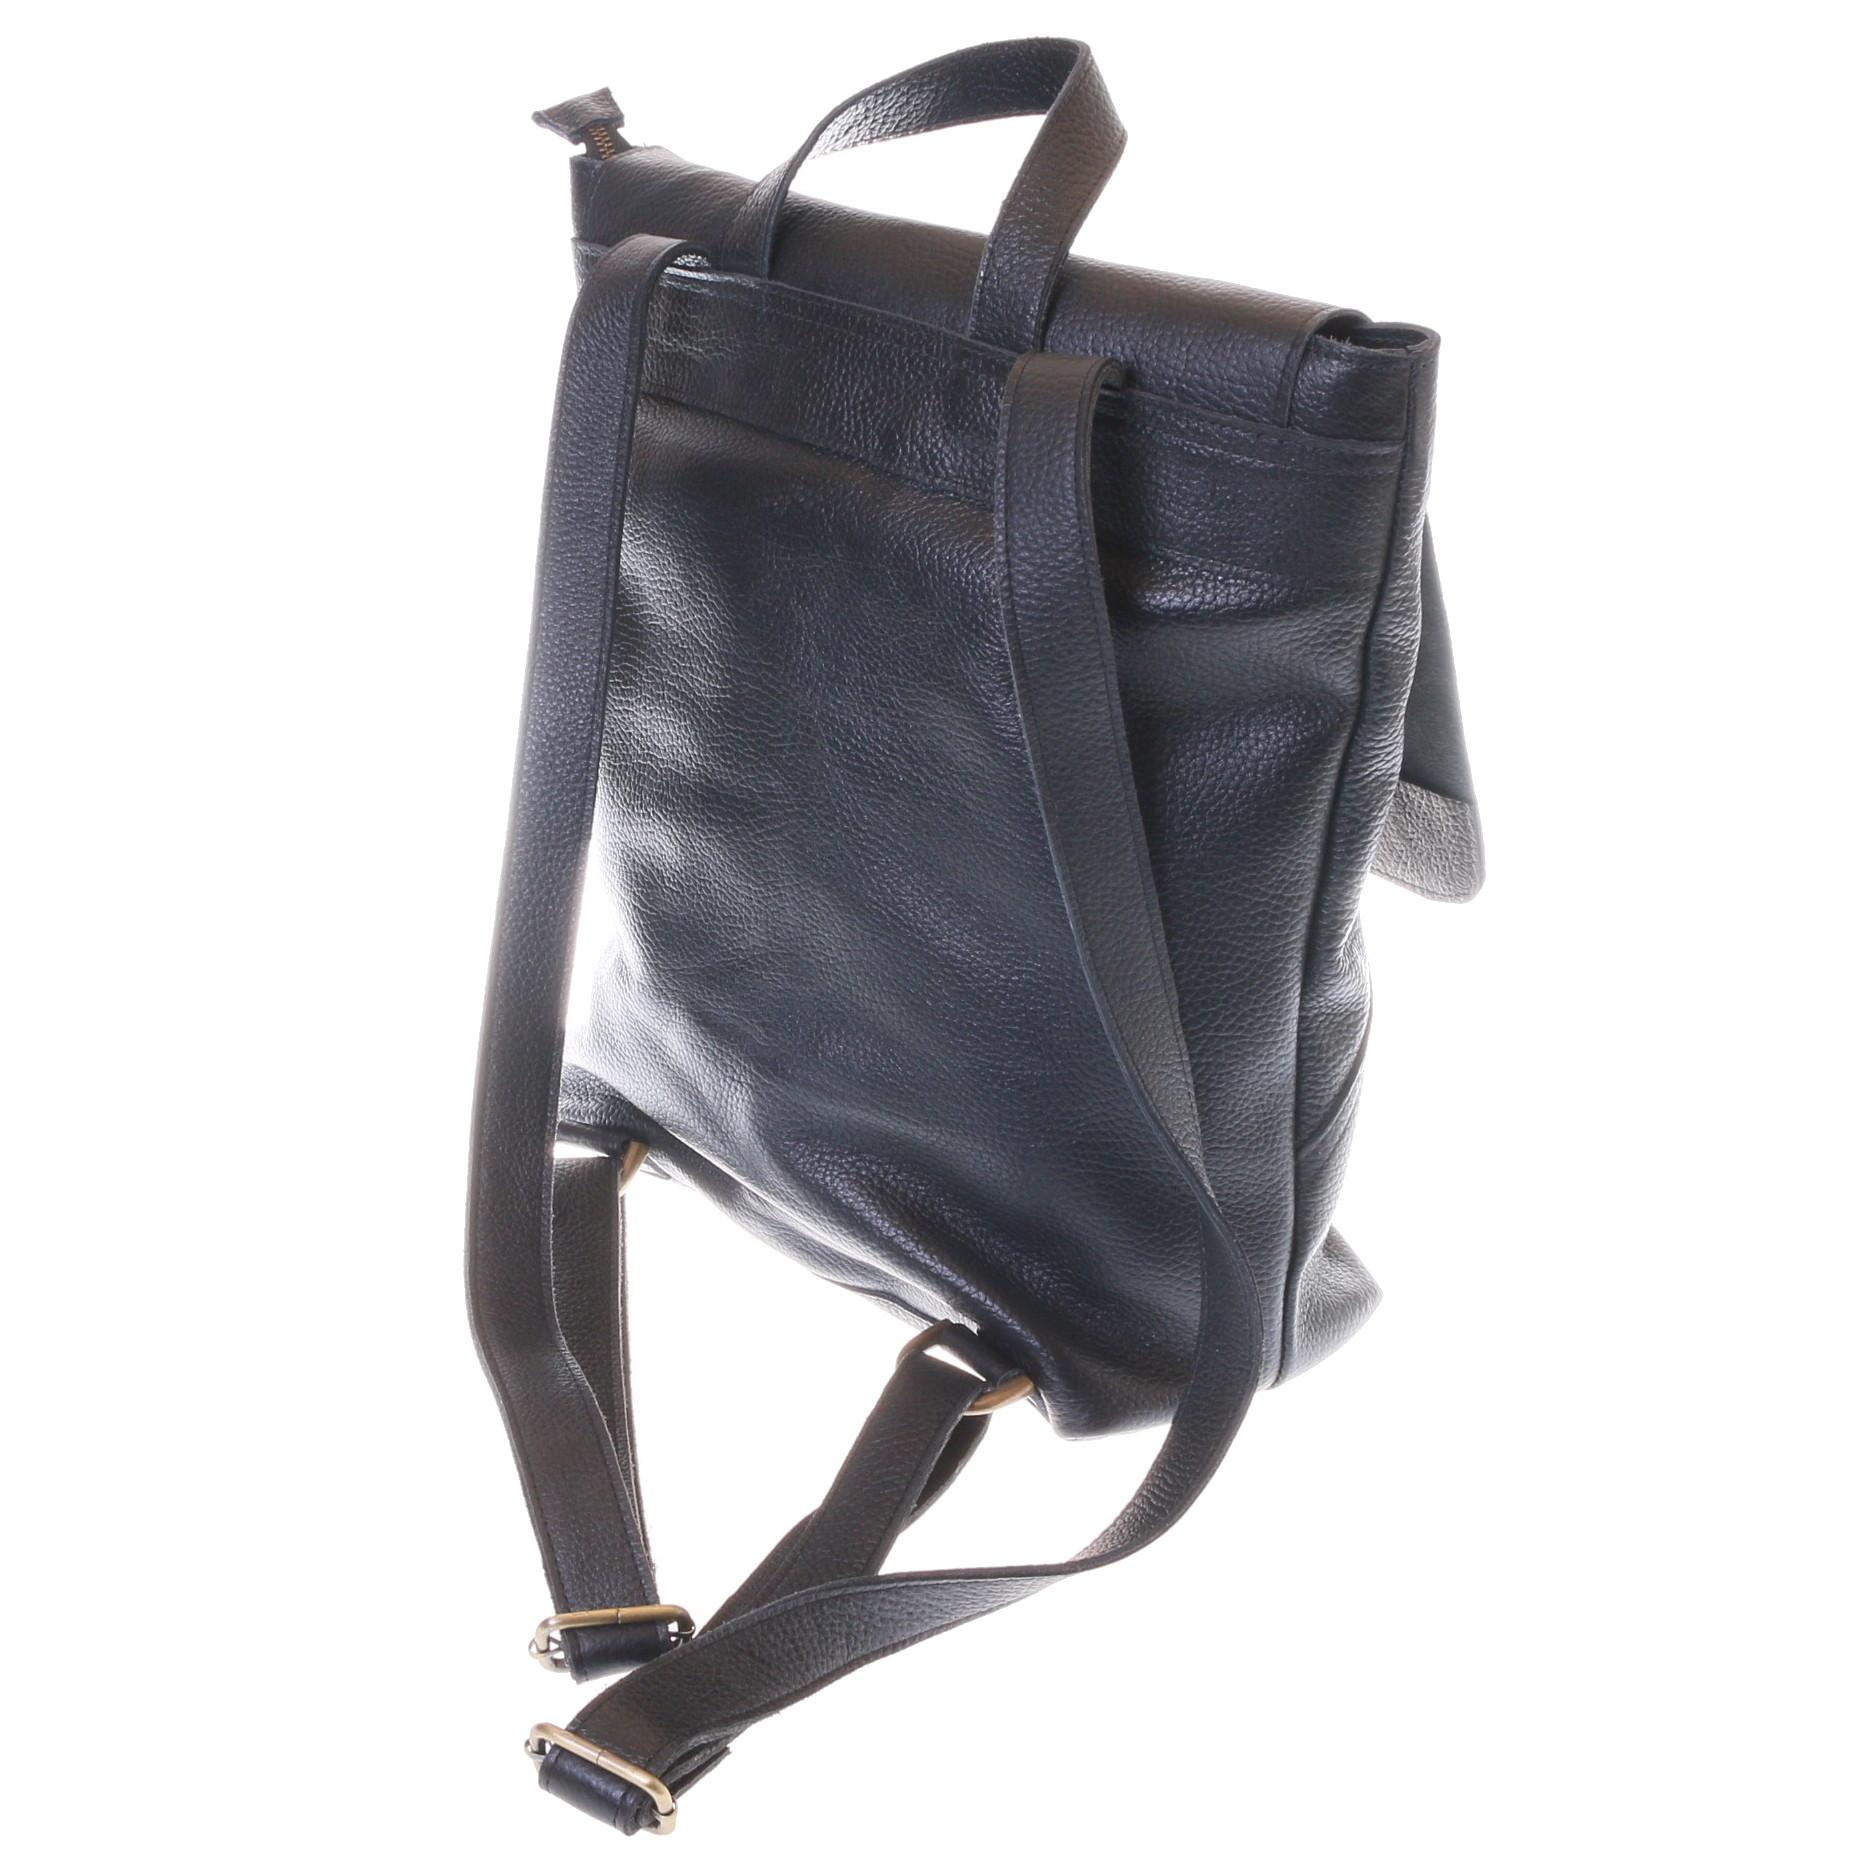 Gundara - fair black cow leather backpack - fairtrade and handmade from Ethiopia